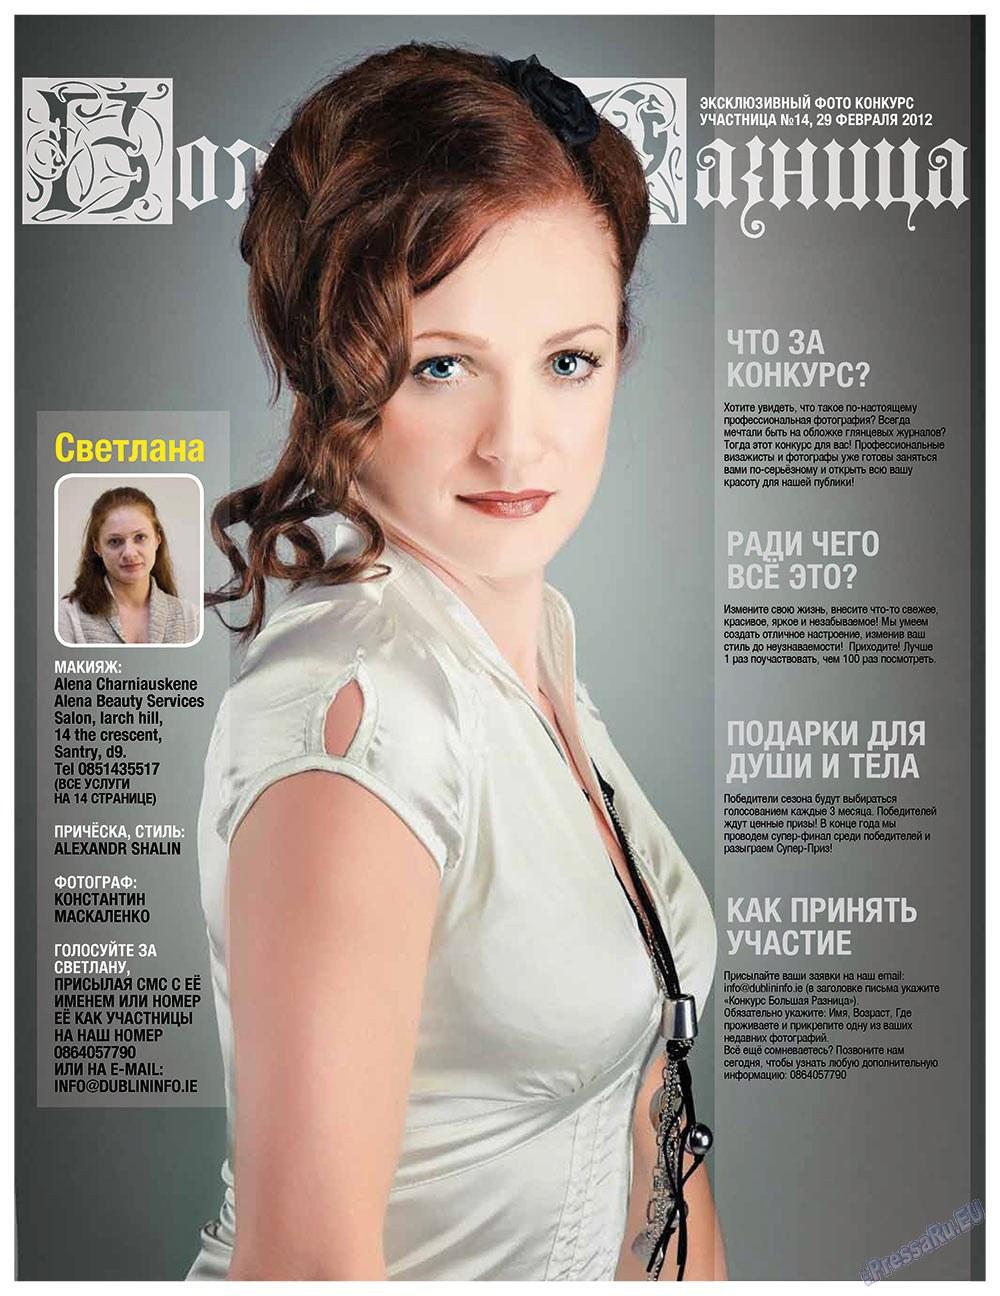 Дублин инфоцентр (газета). 2012 год, номер 8, стр. 6